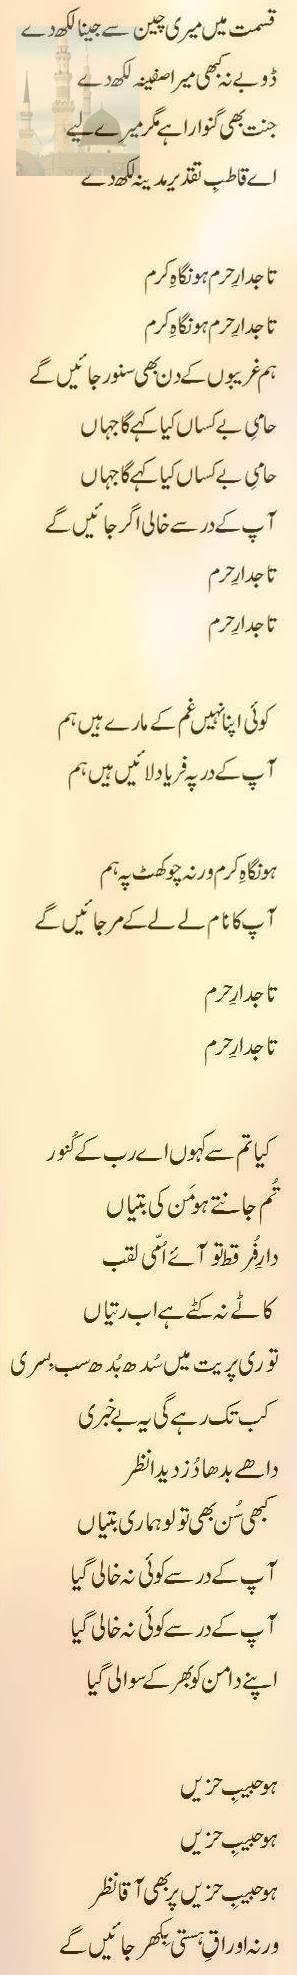 Tjadar e Haram lyrics in Urdu 1